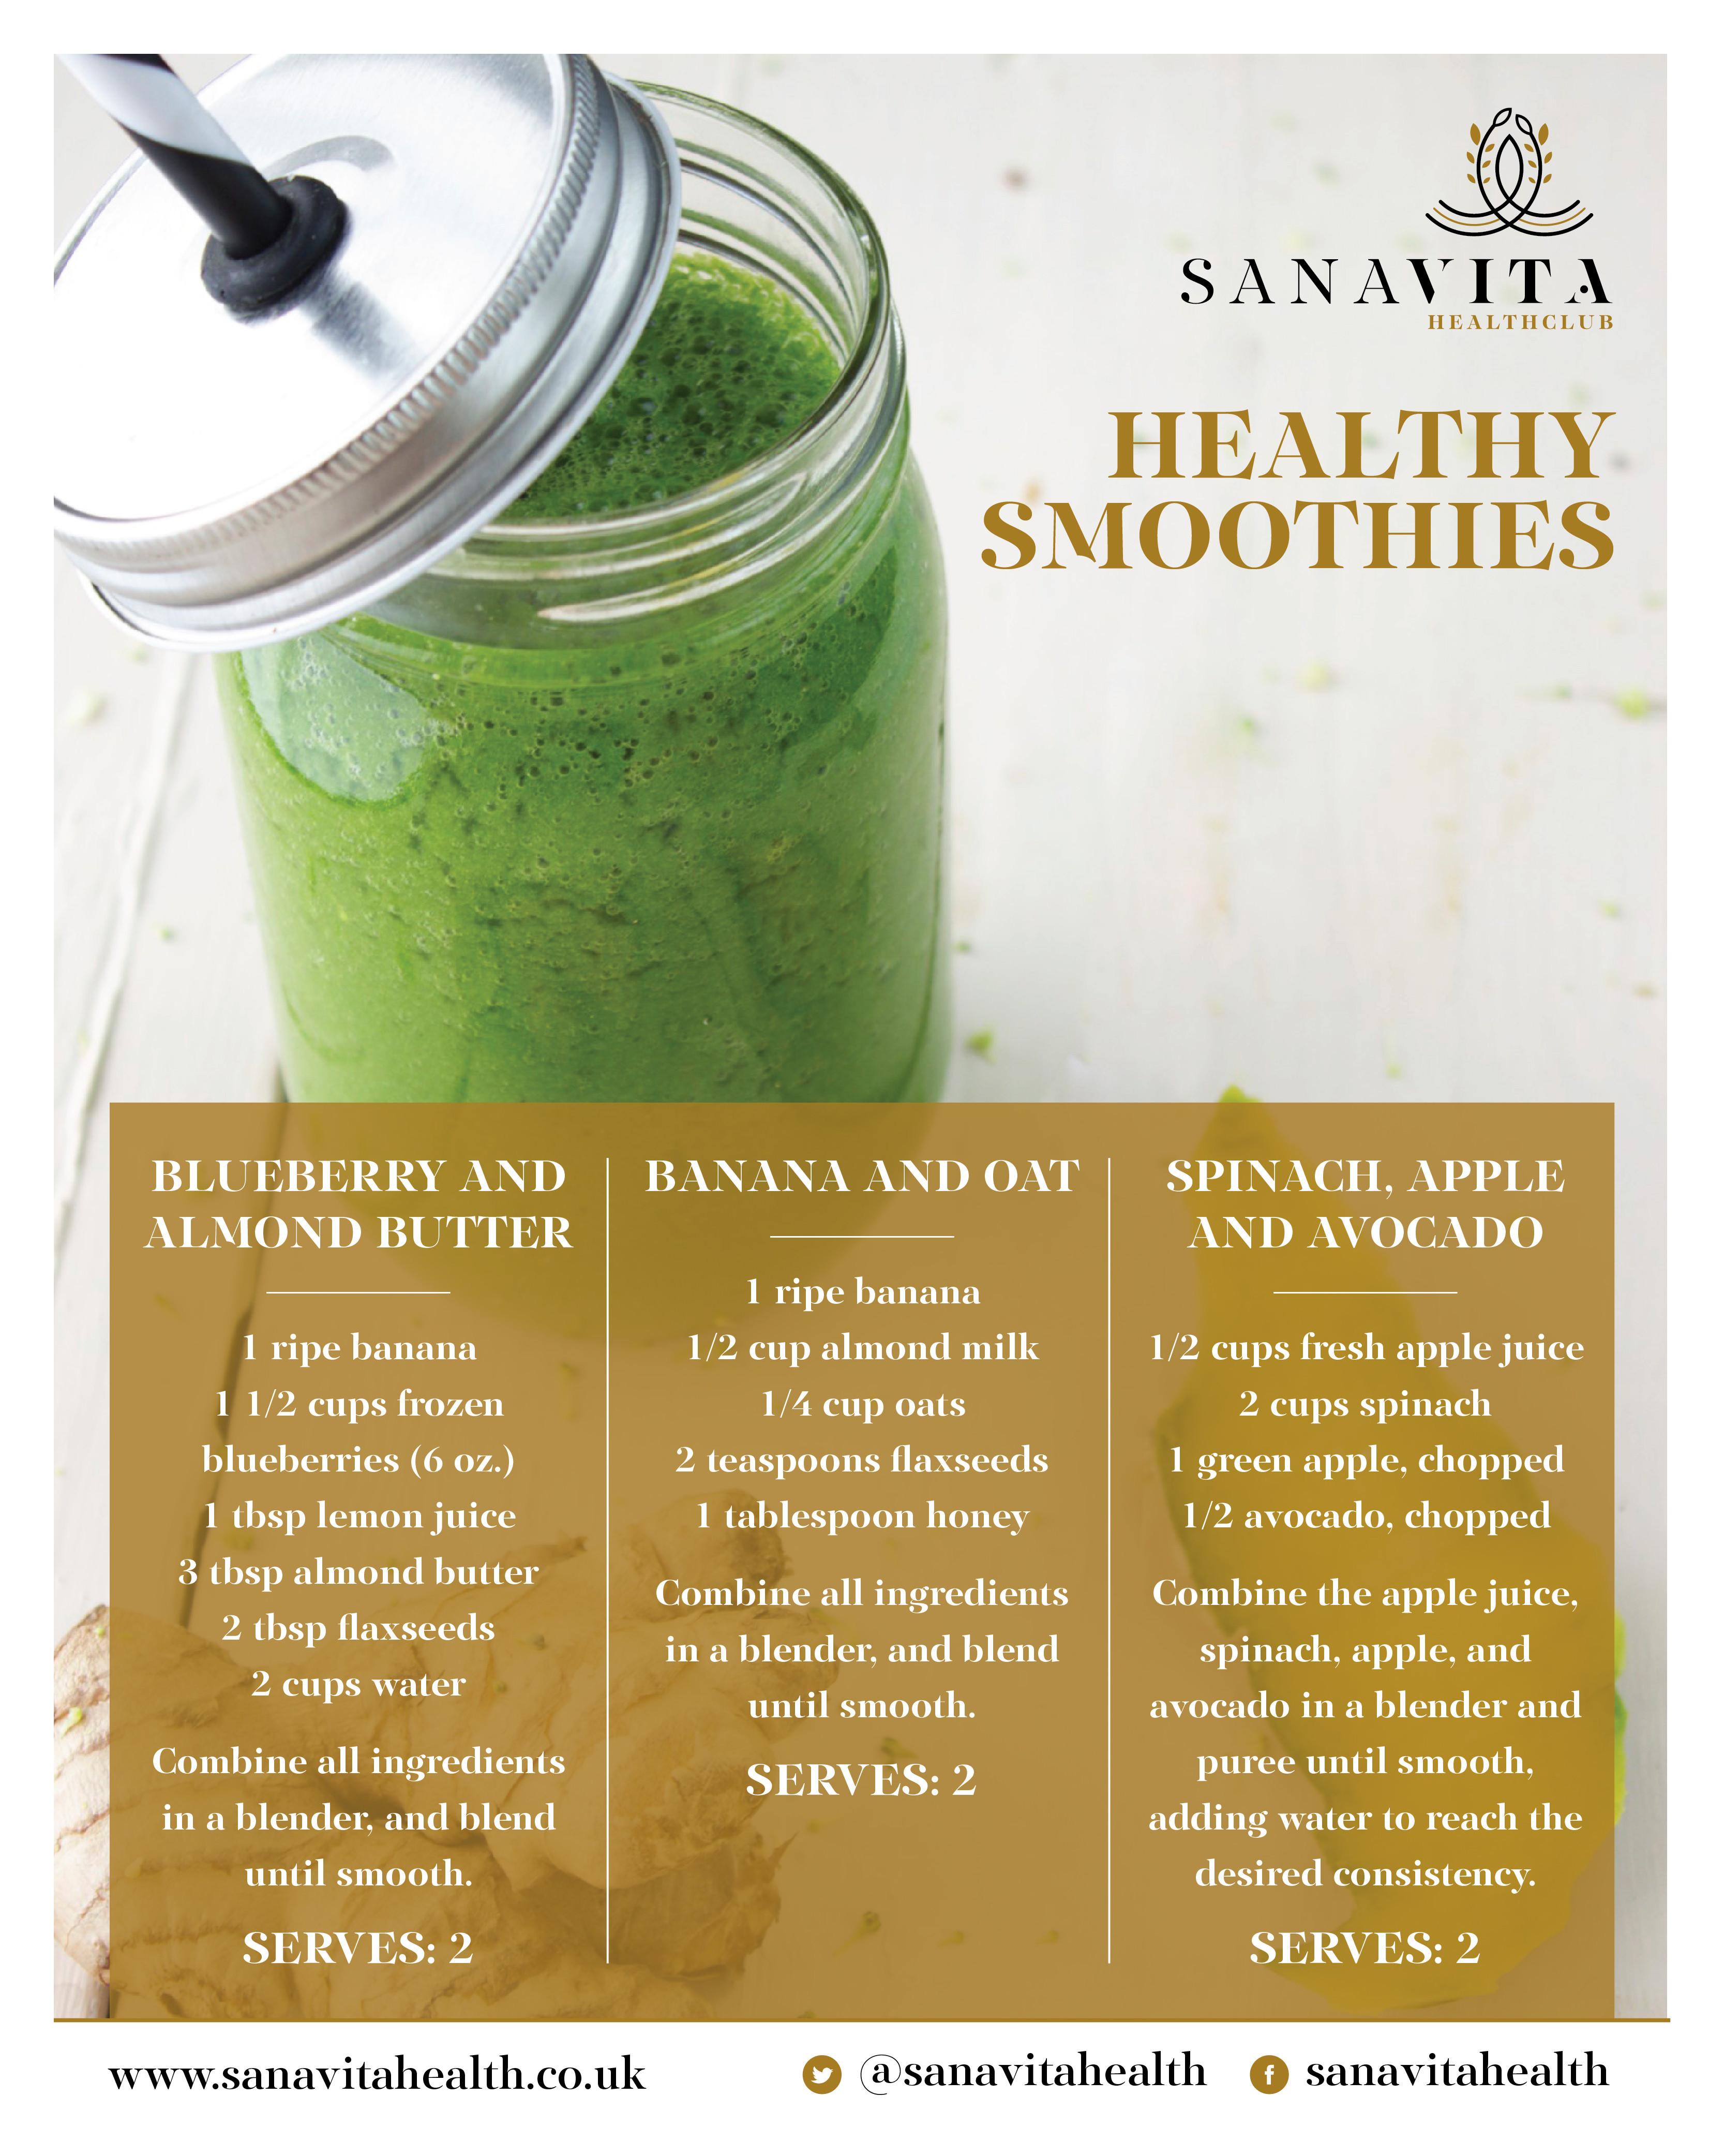 Smoothie Recipes Healthy  Sana Vita Health Club